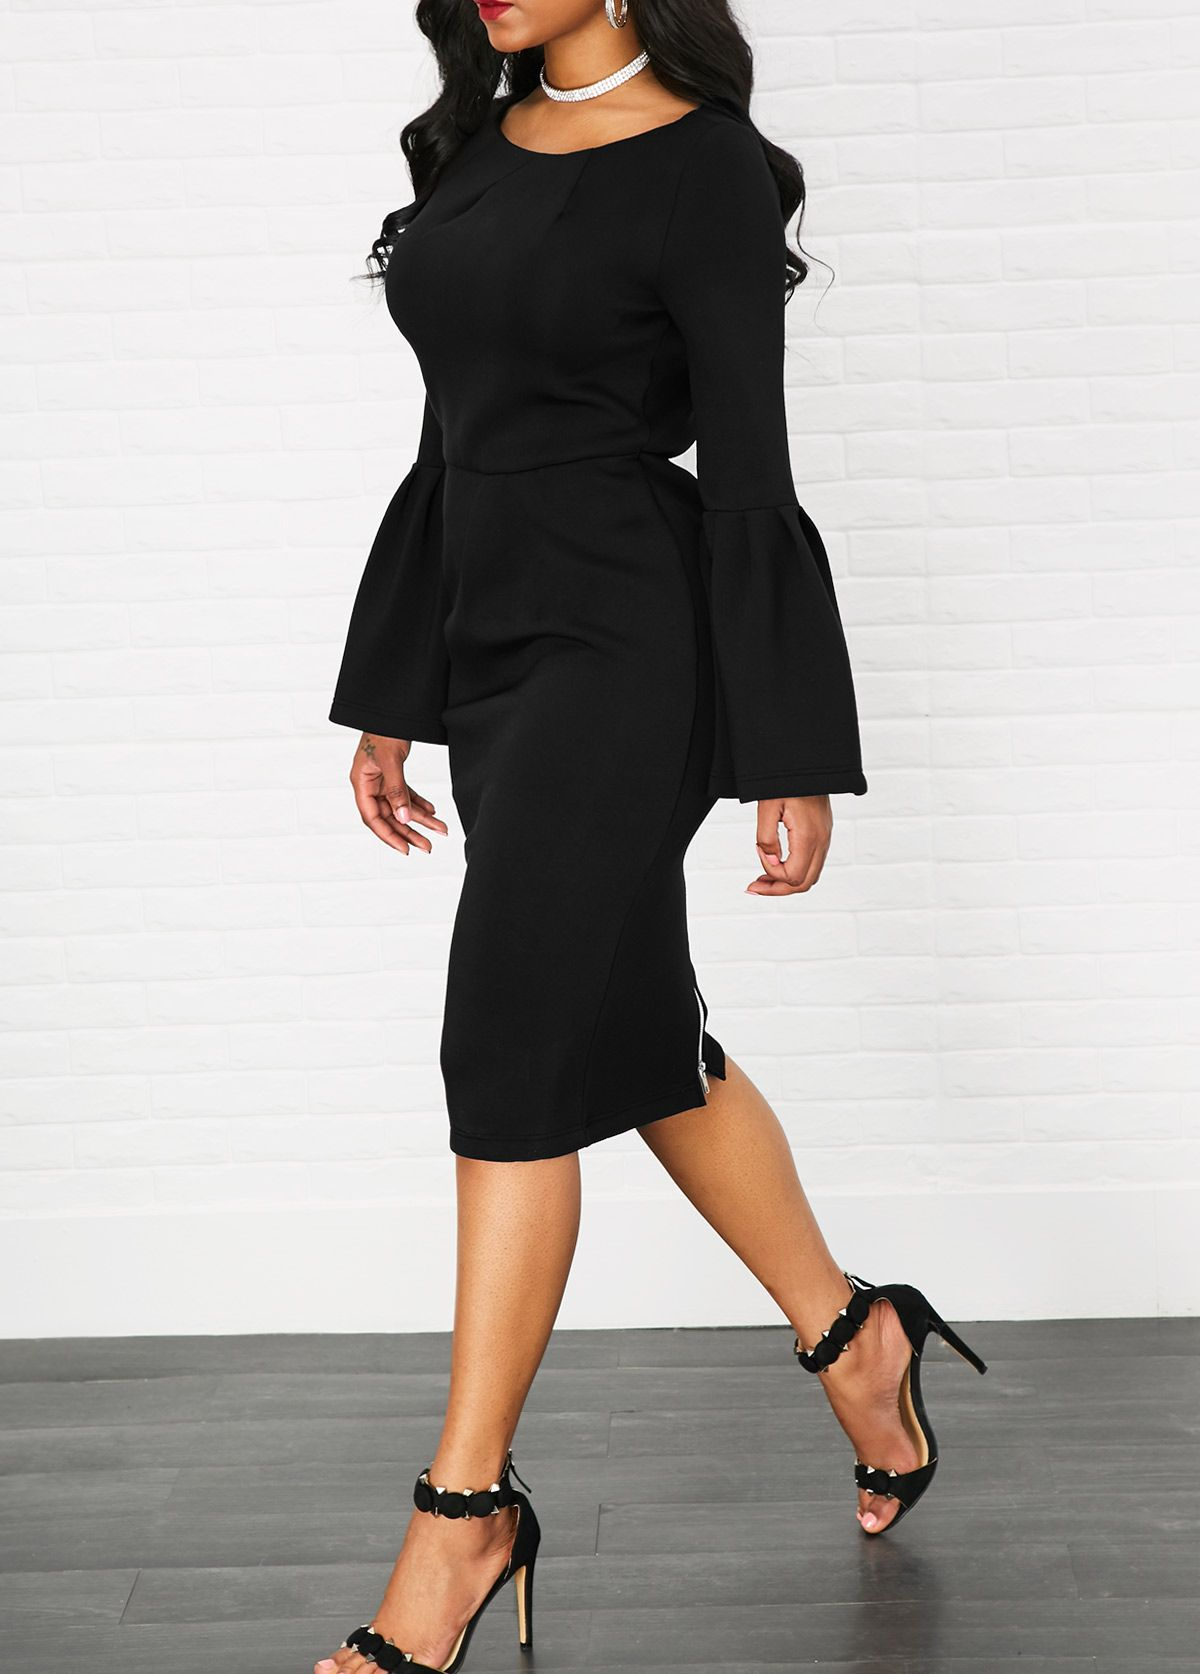 High Waist Zipper Back Flare Sleeve Black Dress Rotita Com Usd 32 77 Black Dress With Sleeves Black Dress Little Black Dress [ 1674 x 1200 Pixel ]